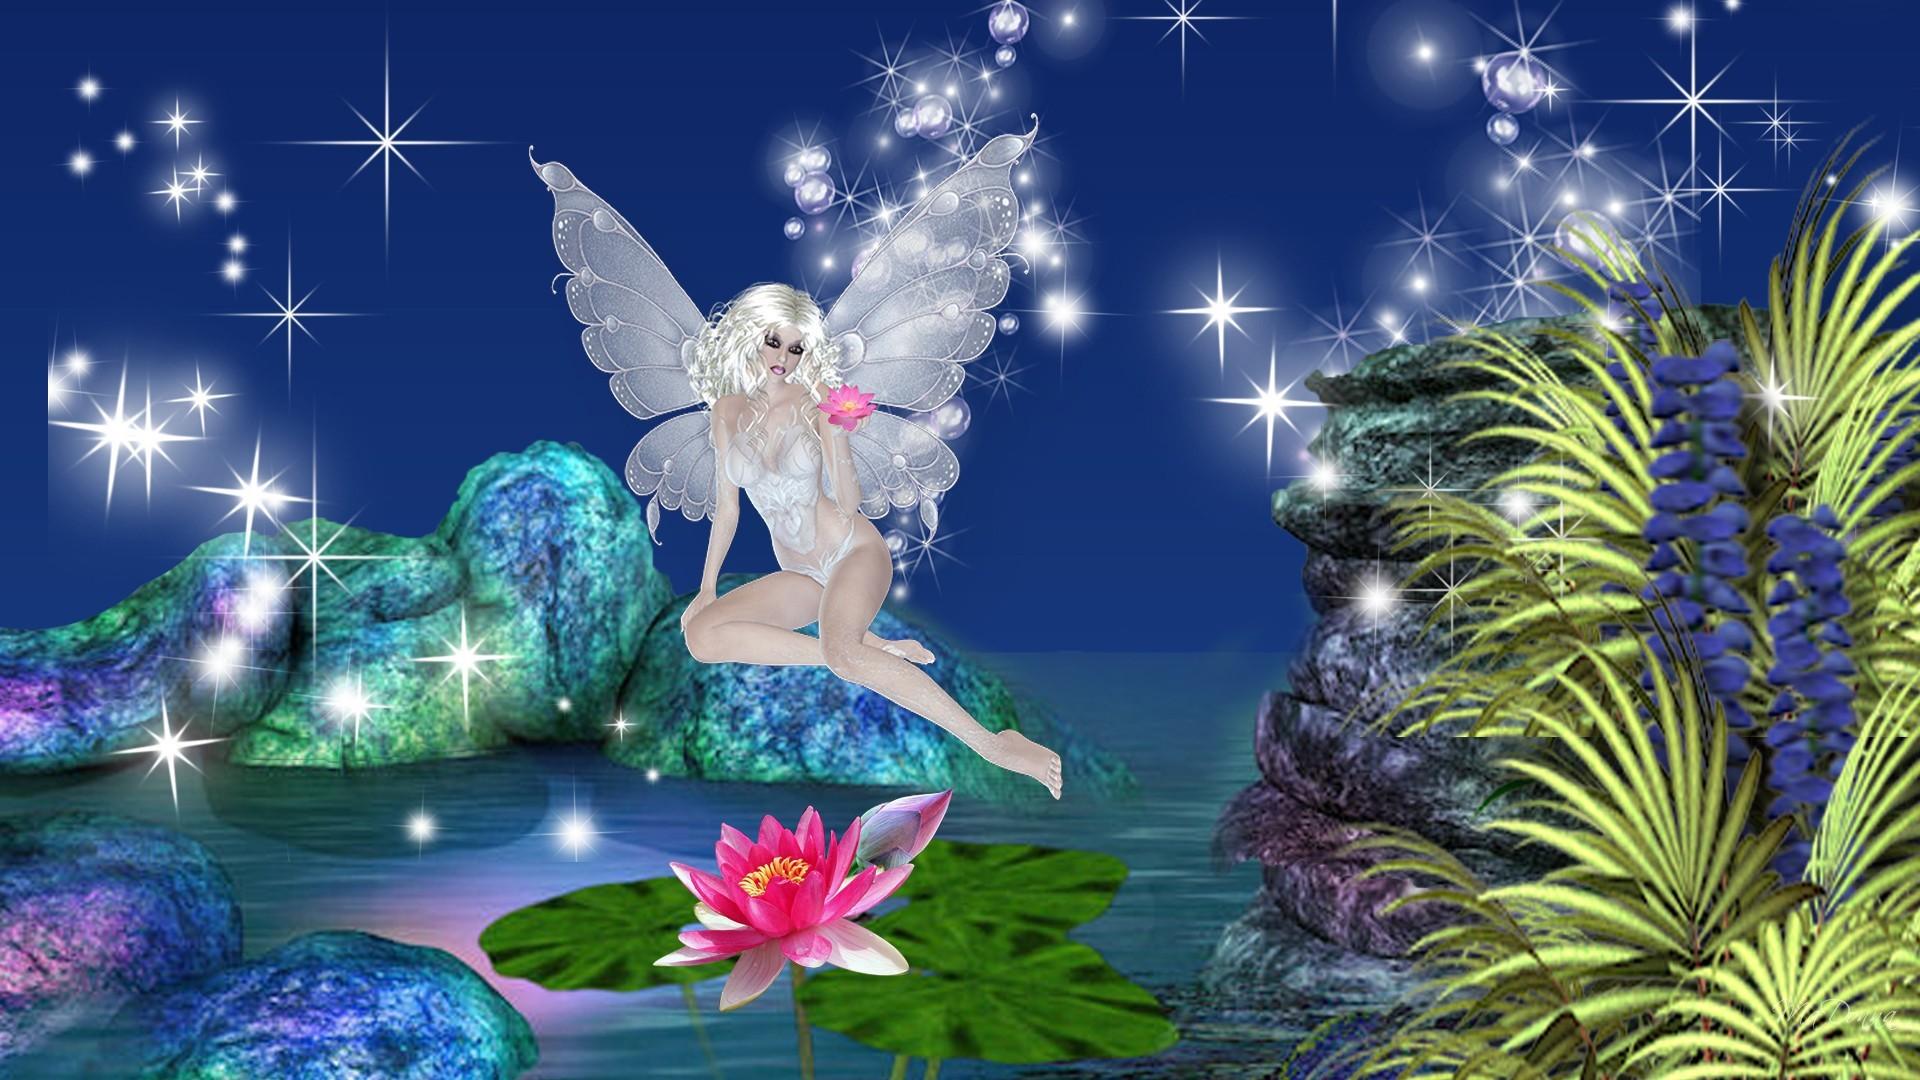 fairy desktop wallpaper 63 images